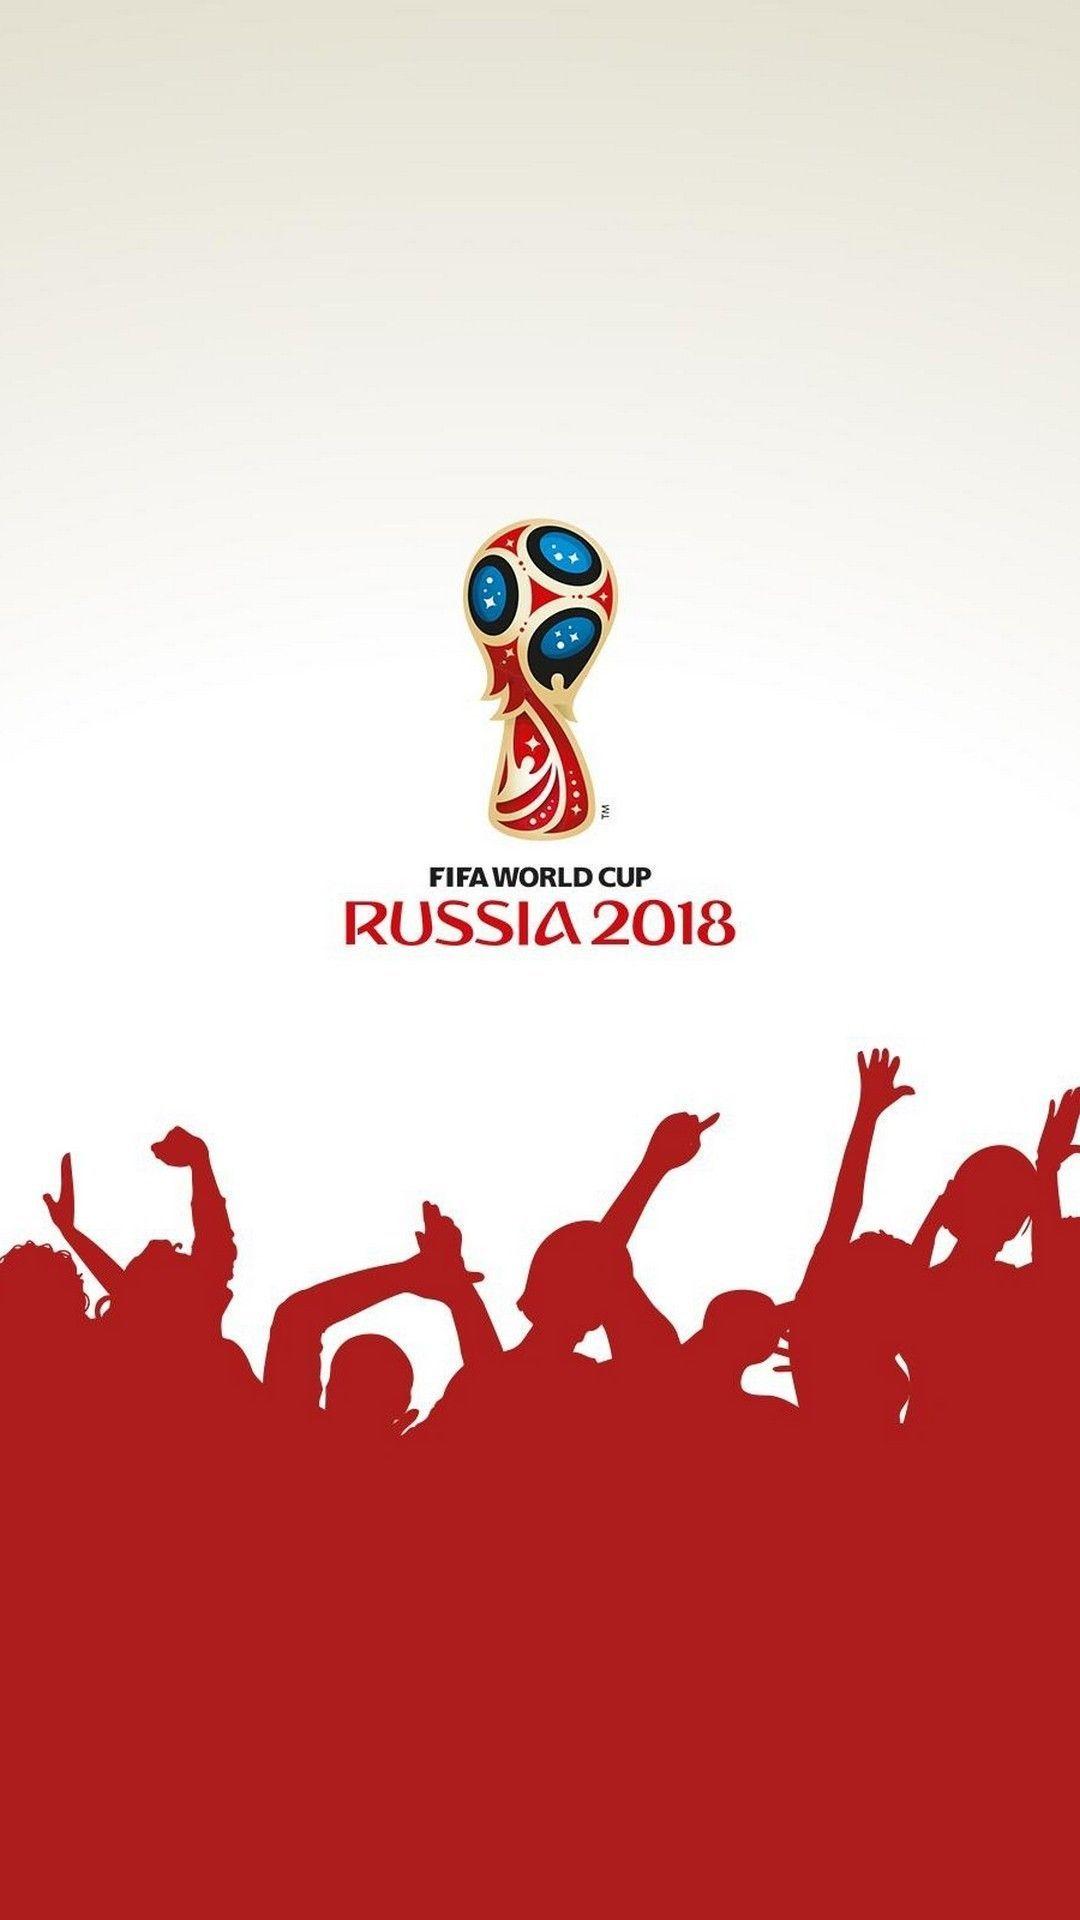 Russia 2018 Fifa World Cup World Cup Fifa Fifa World Cup Fifa world cup wallpapers hd